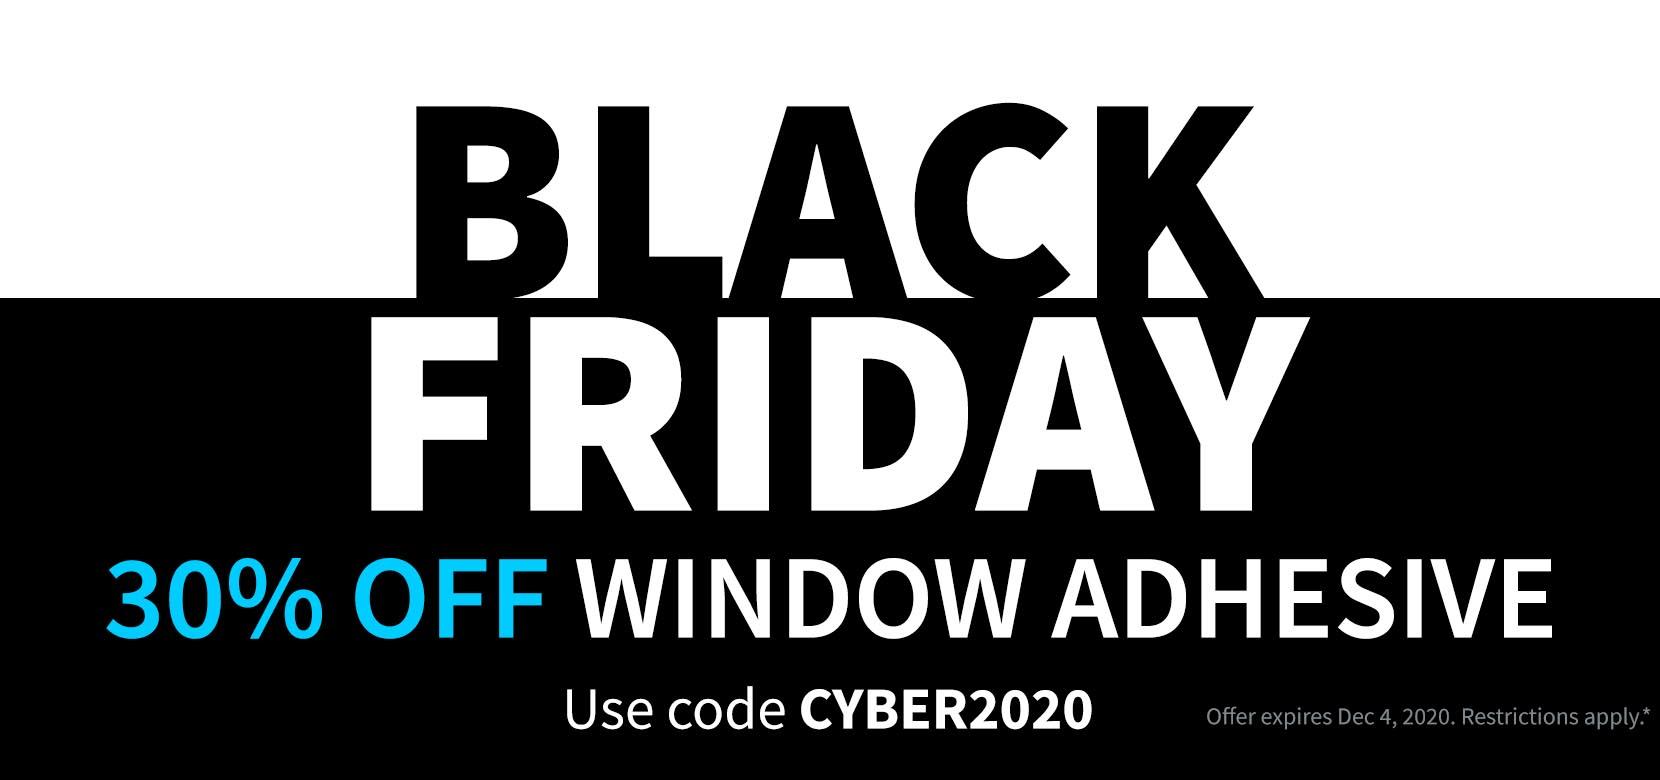 Black Friday CYBER2020 Clear Window Decals